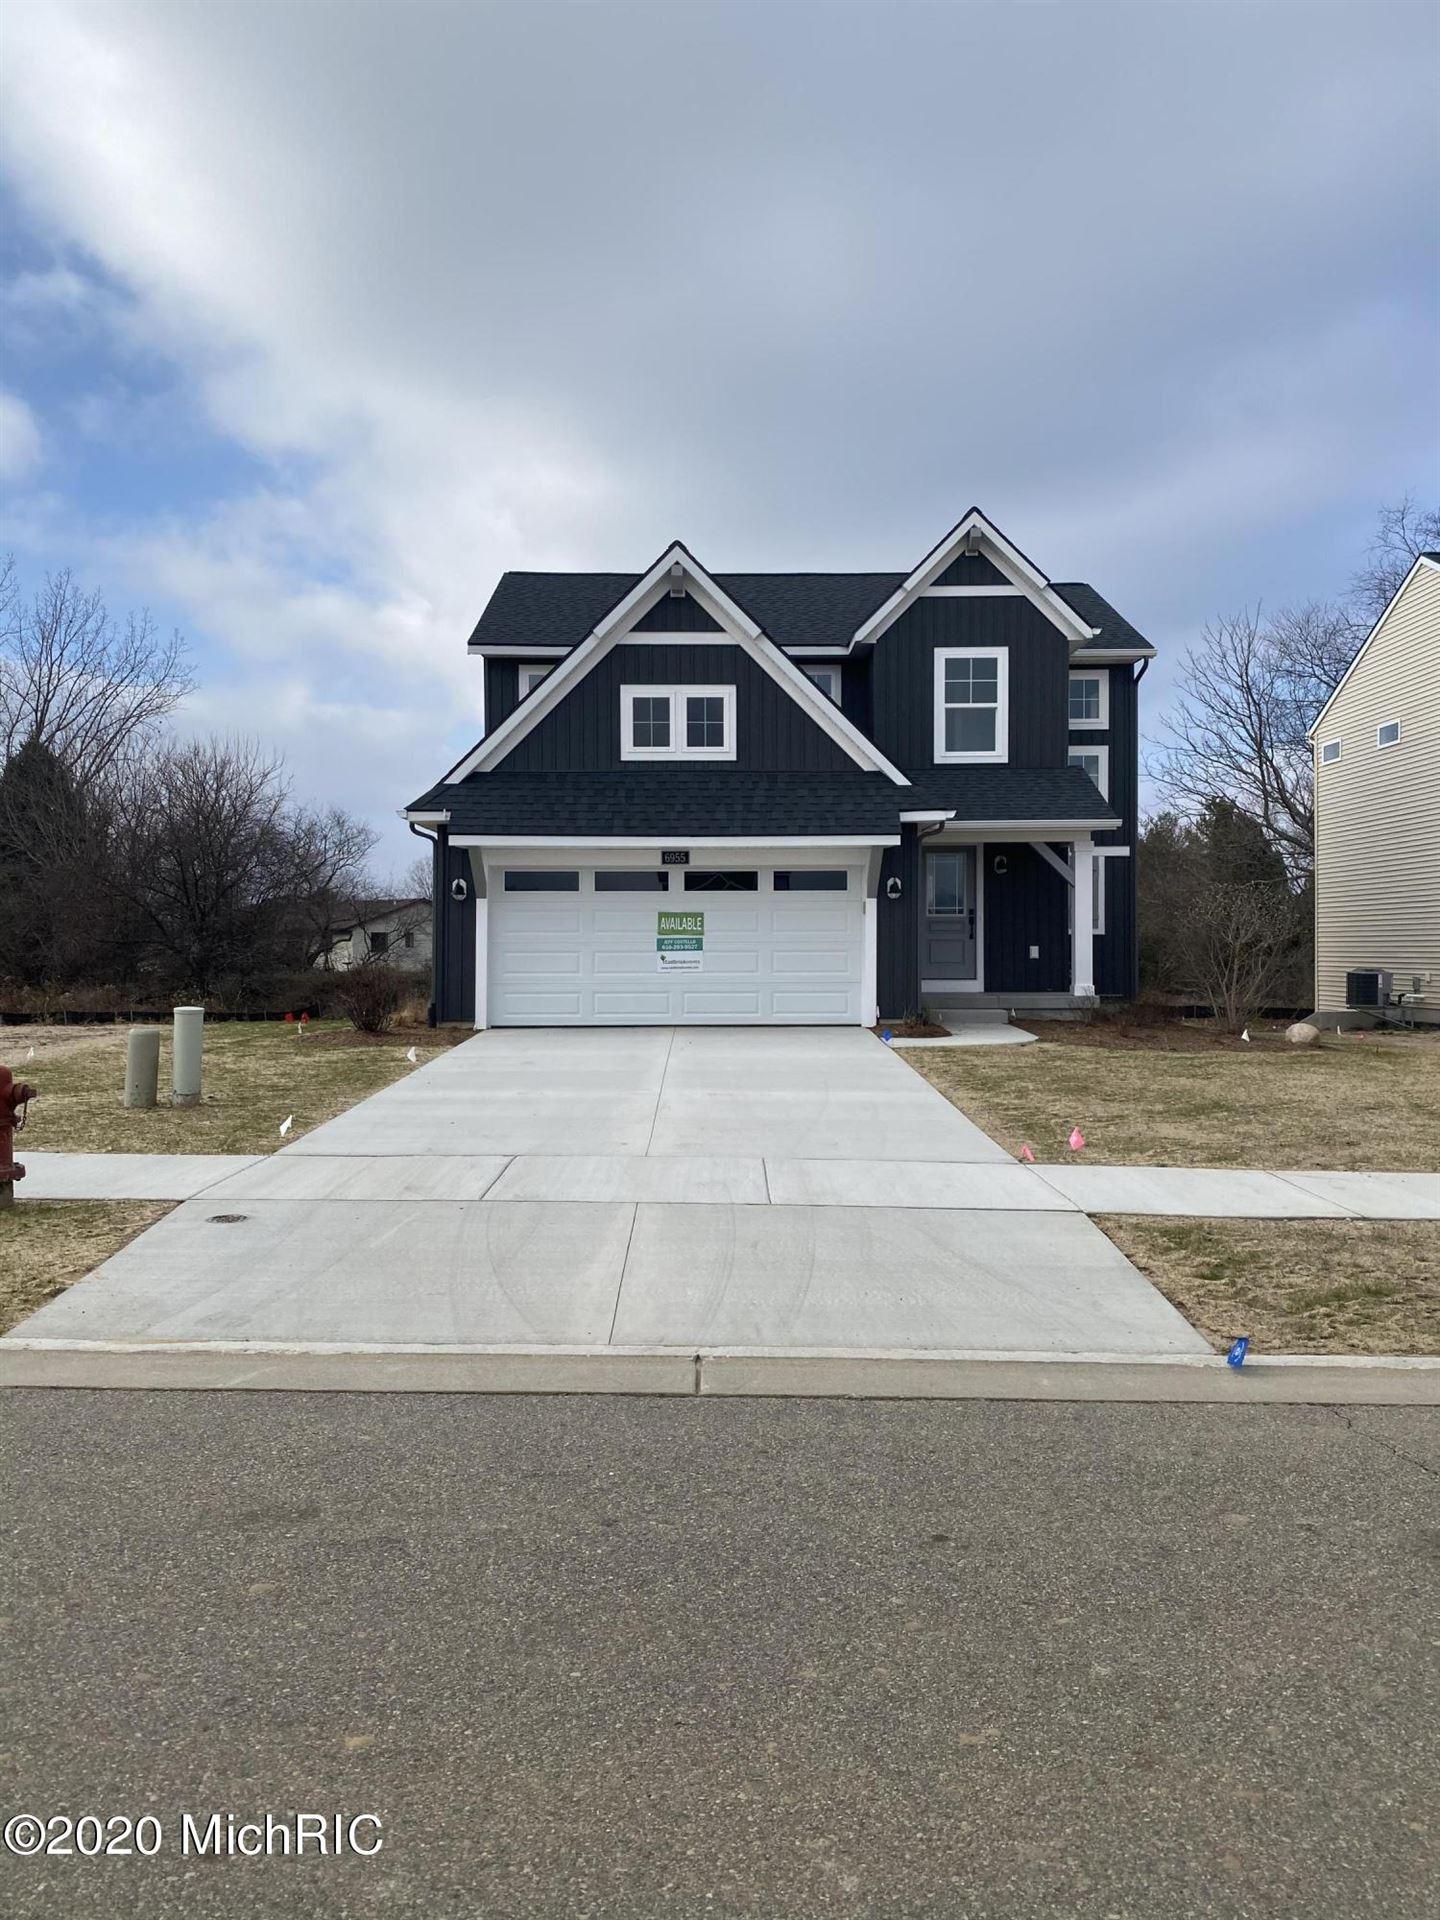 Photo of 6955 West Cottage #25, Rockford, MI 49341 (MLS # 20018032)